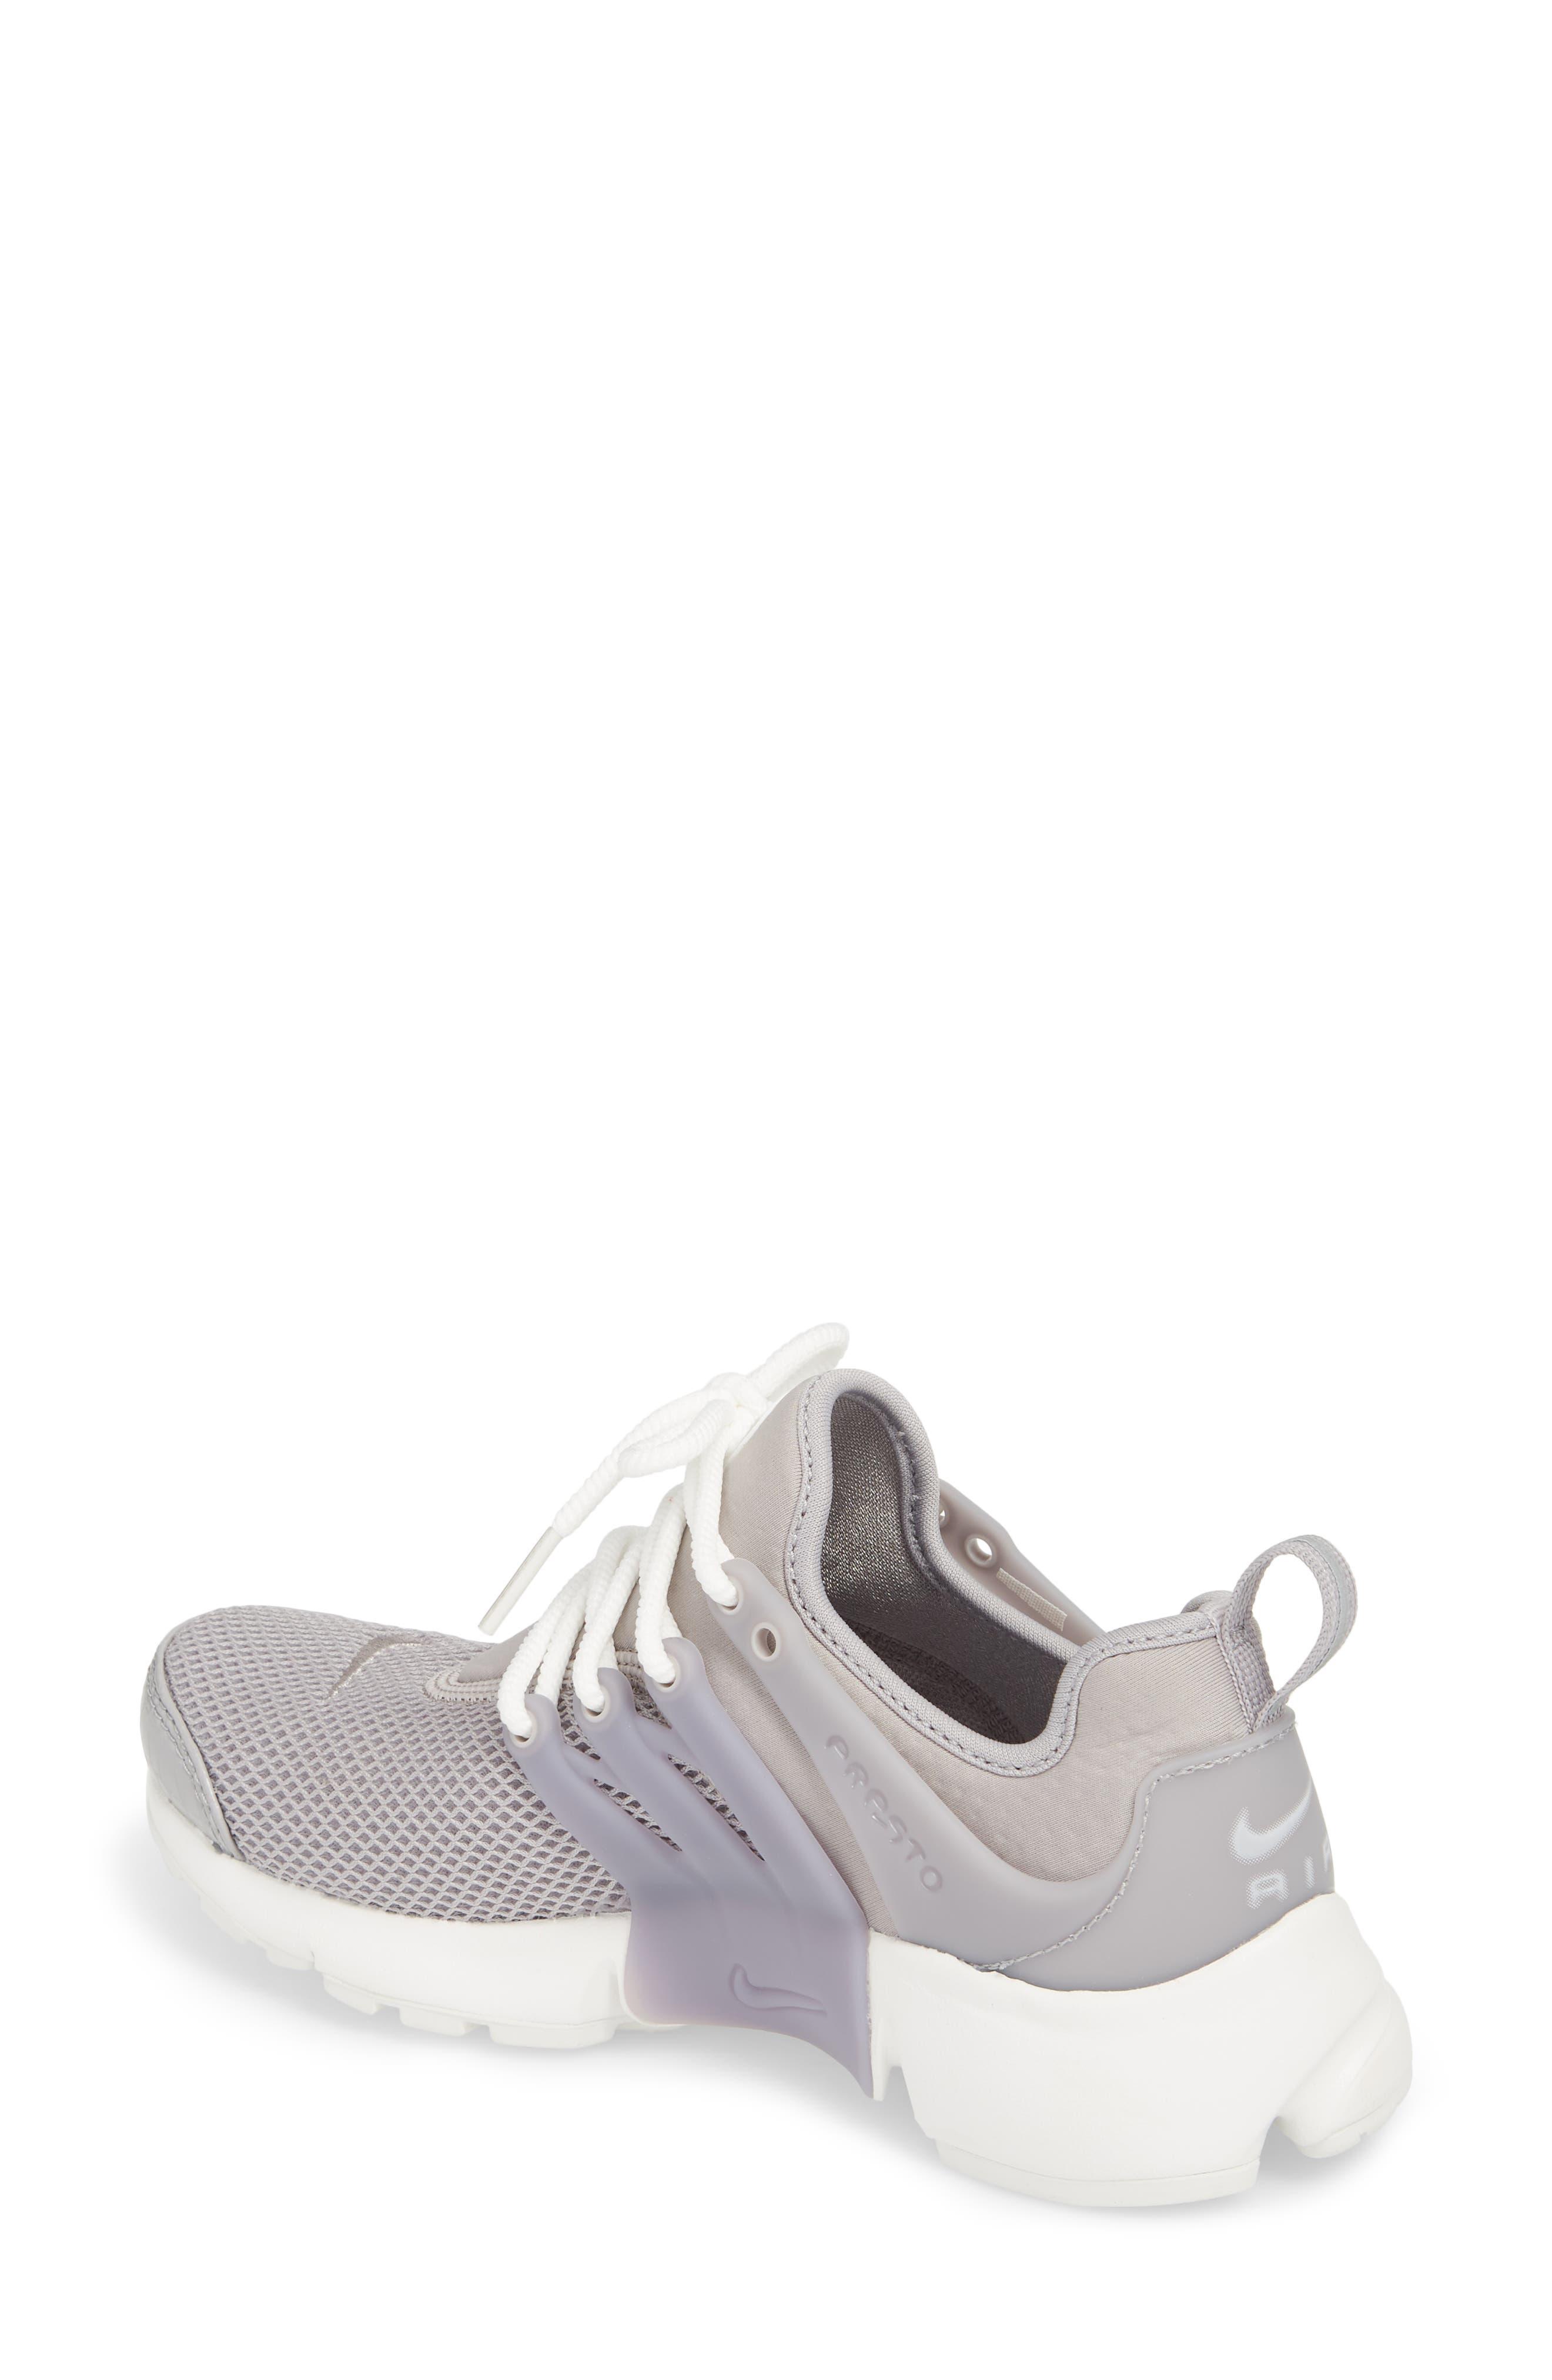 Air Presto SE Sneaker,                             Alternate thumbnail 2, color,                             021